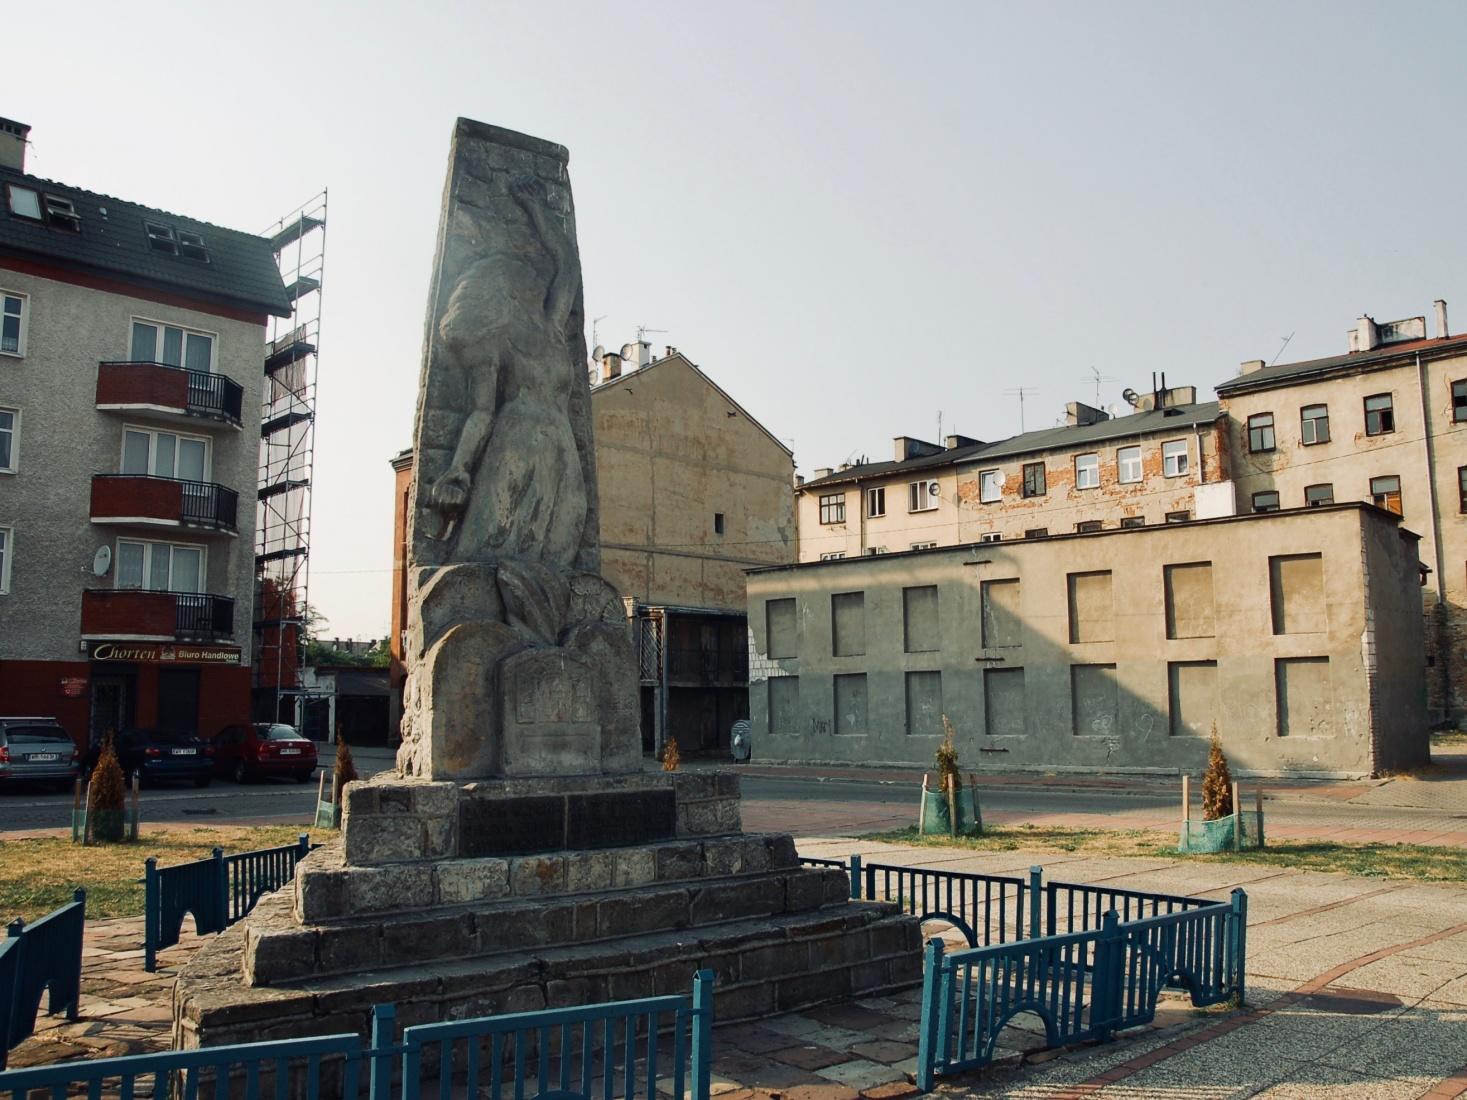 A Holocaust memorial in Radom, Poland, marking the site of a former synagogue.